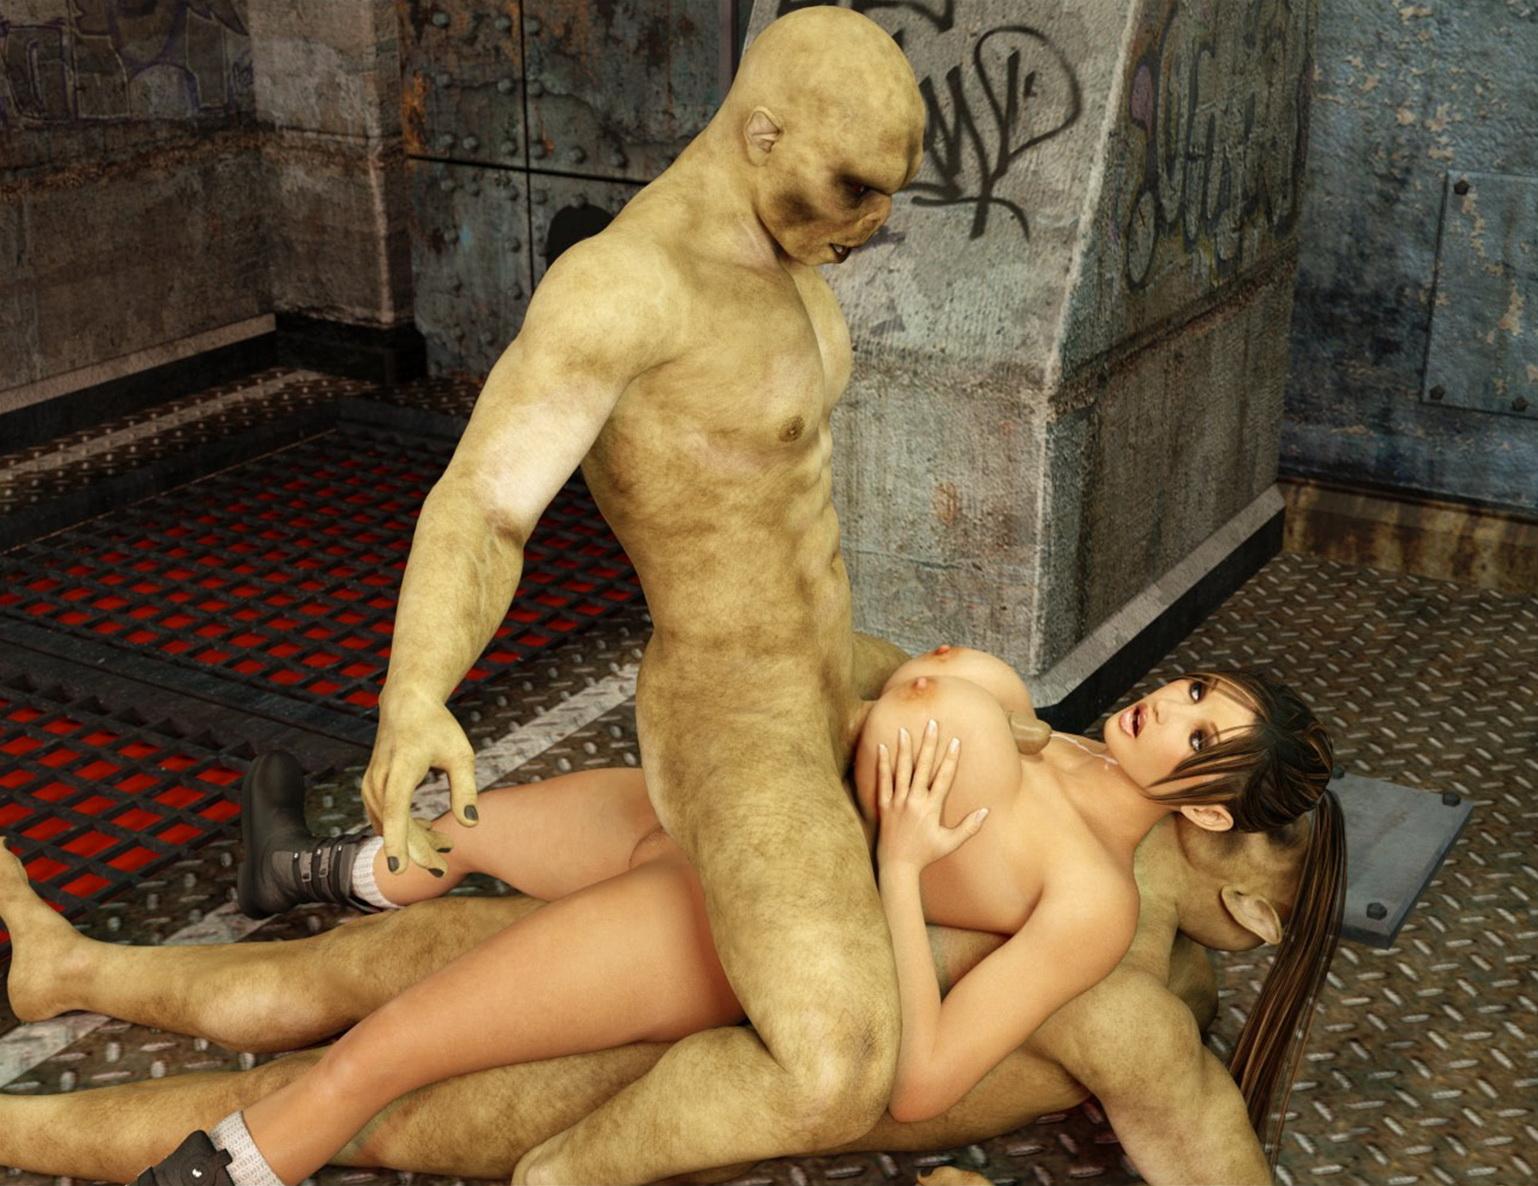 Zombie animated fuck porn scene